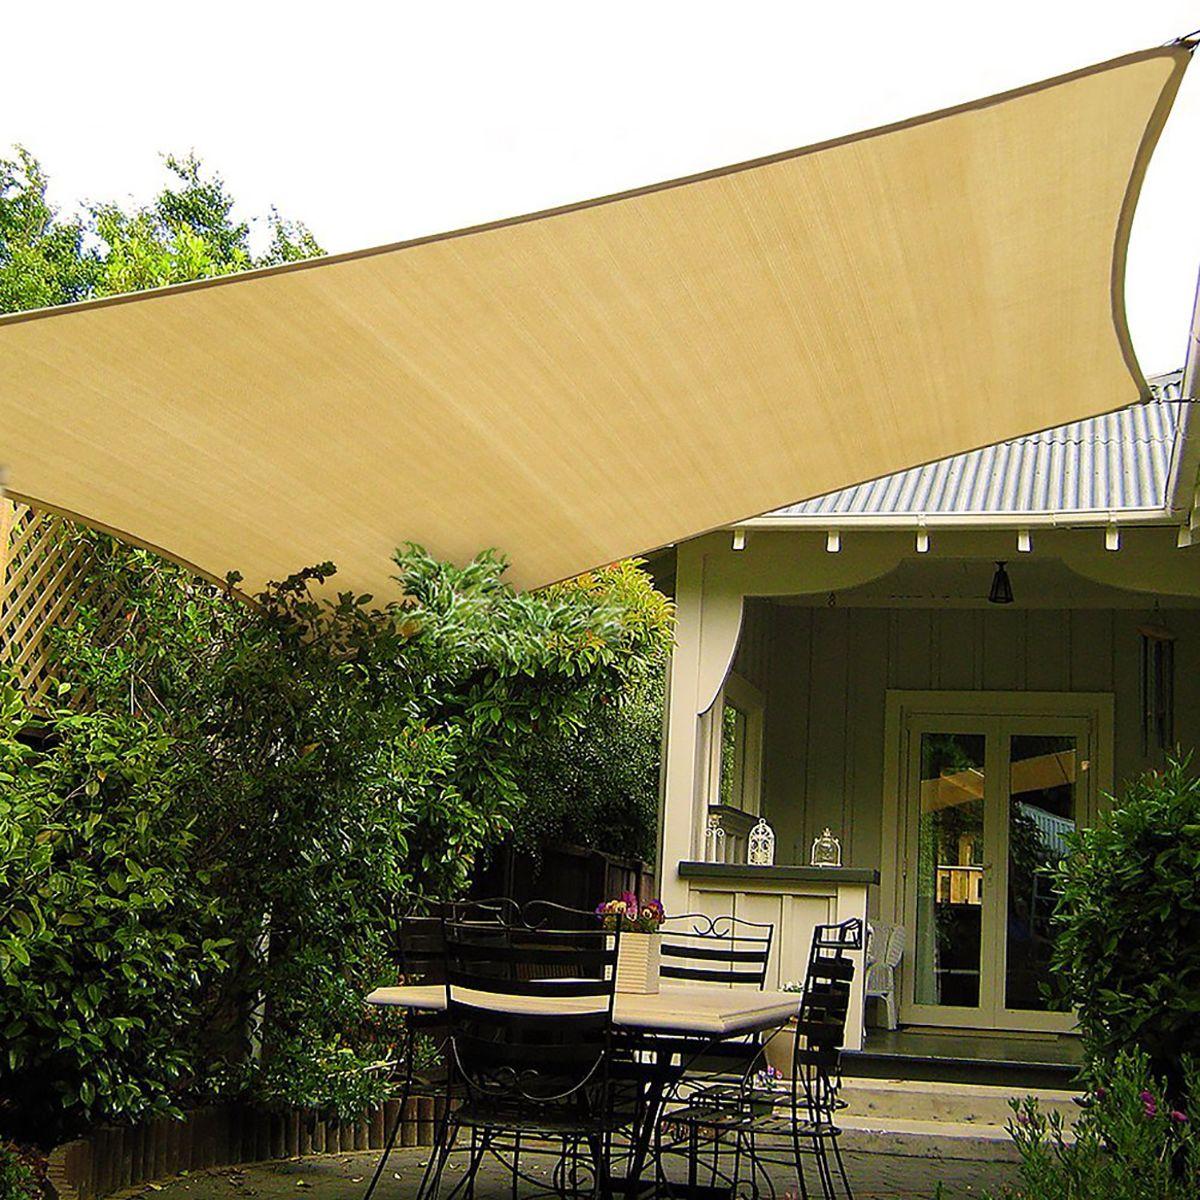 Backyard Sailcloth Retractable Awnings Google Search Shade Sail Sun Sail Shade Canopy Outdoor